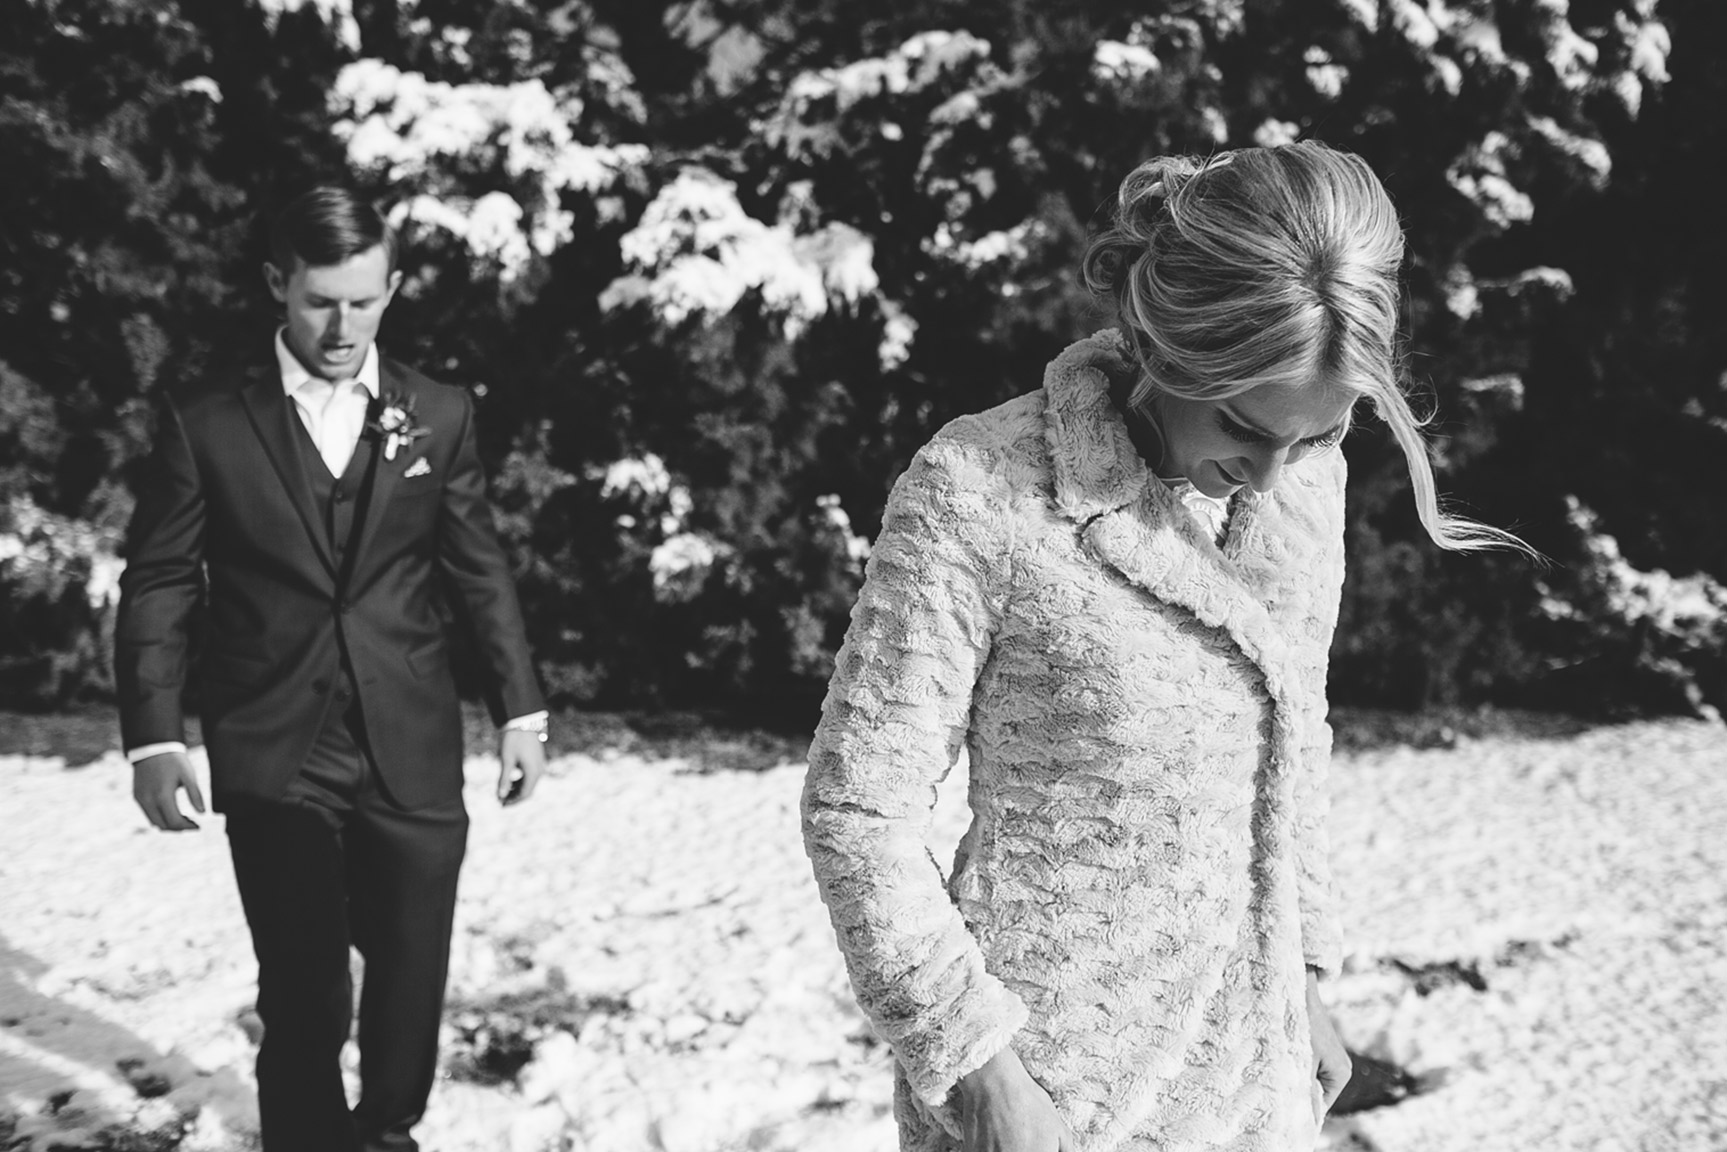 Cotton_Creek_Barn_Winter_Wedding_WeddingPhotographer024.jpg